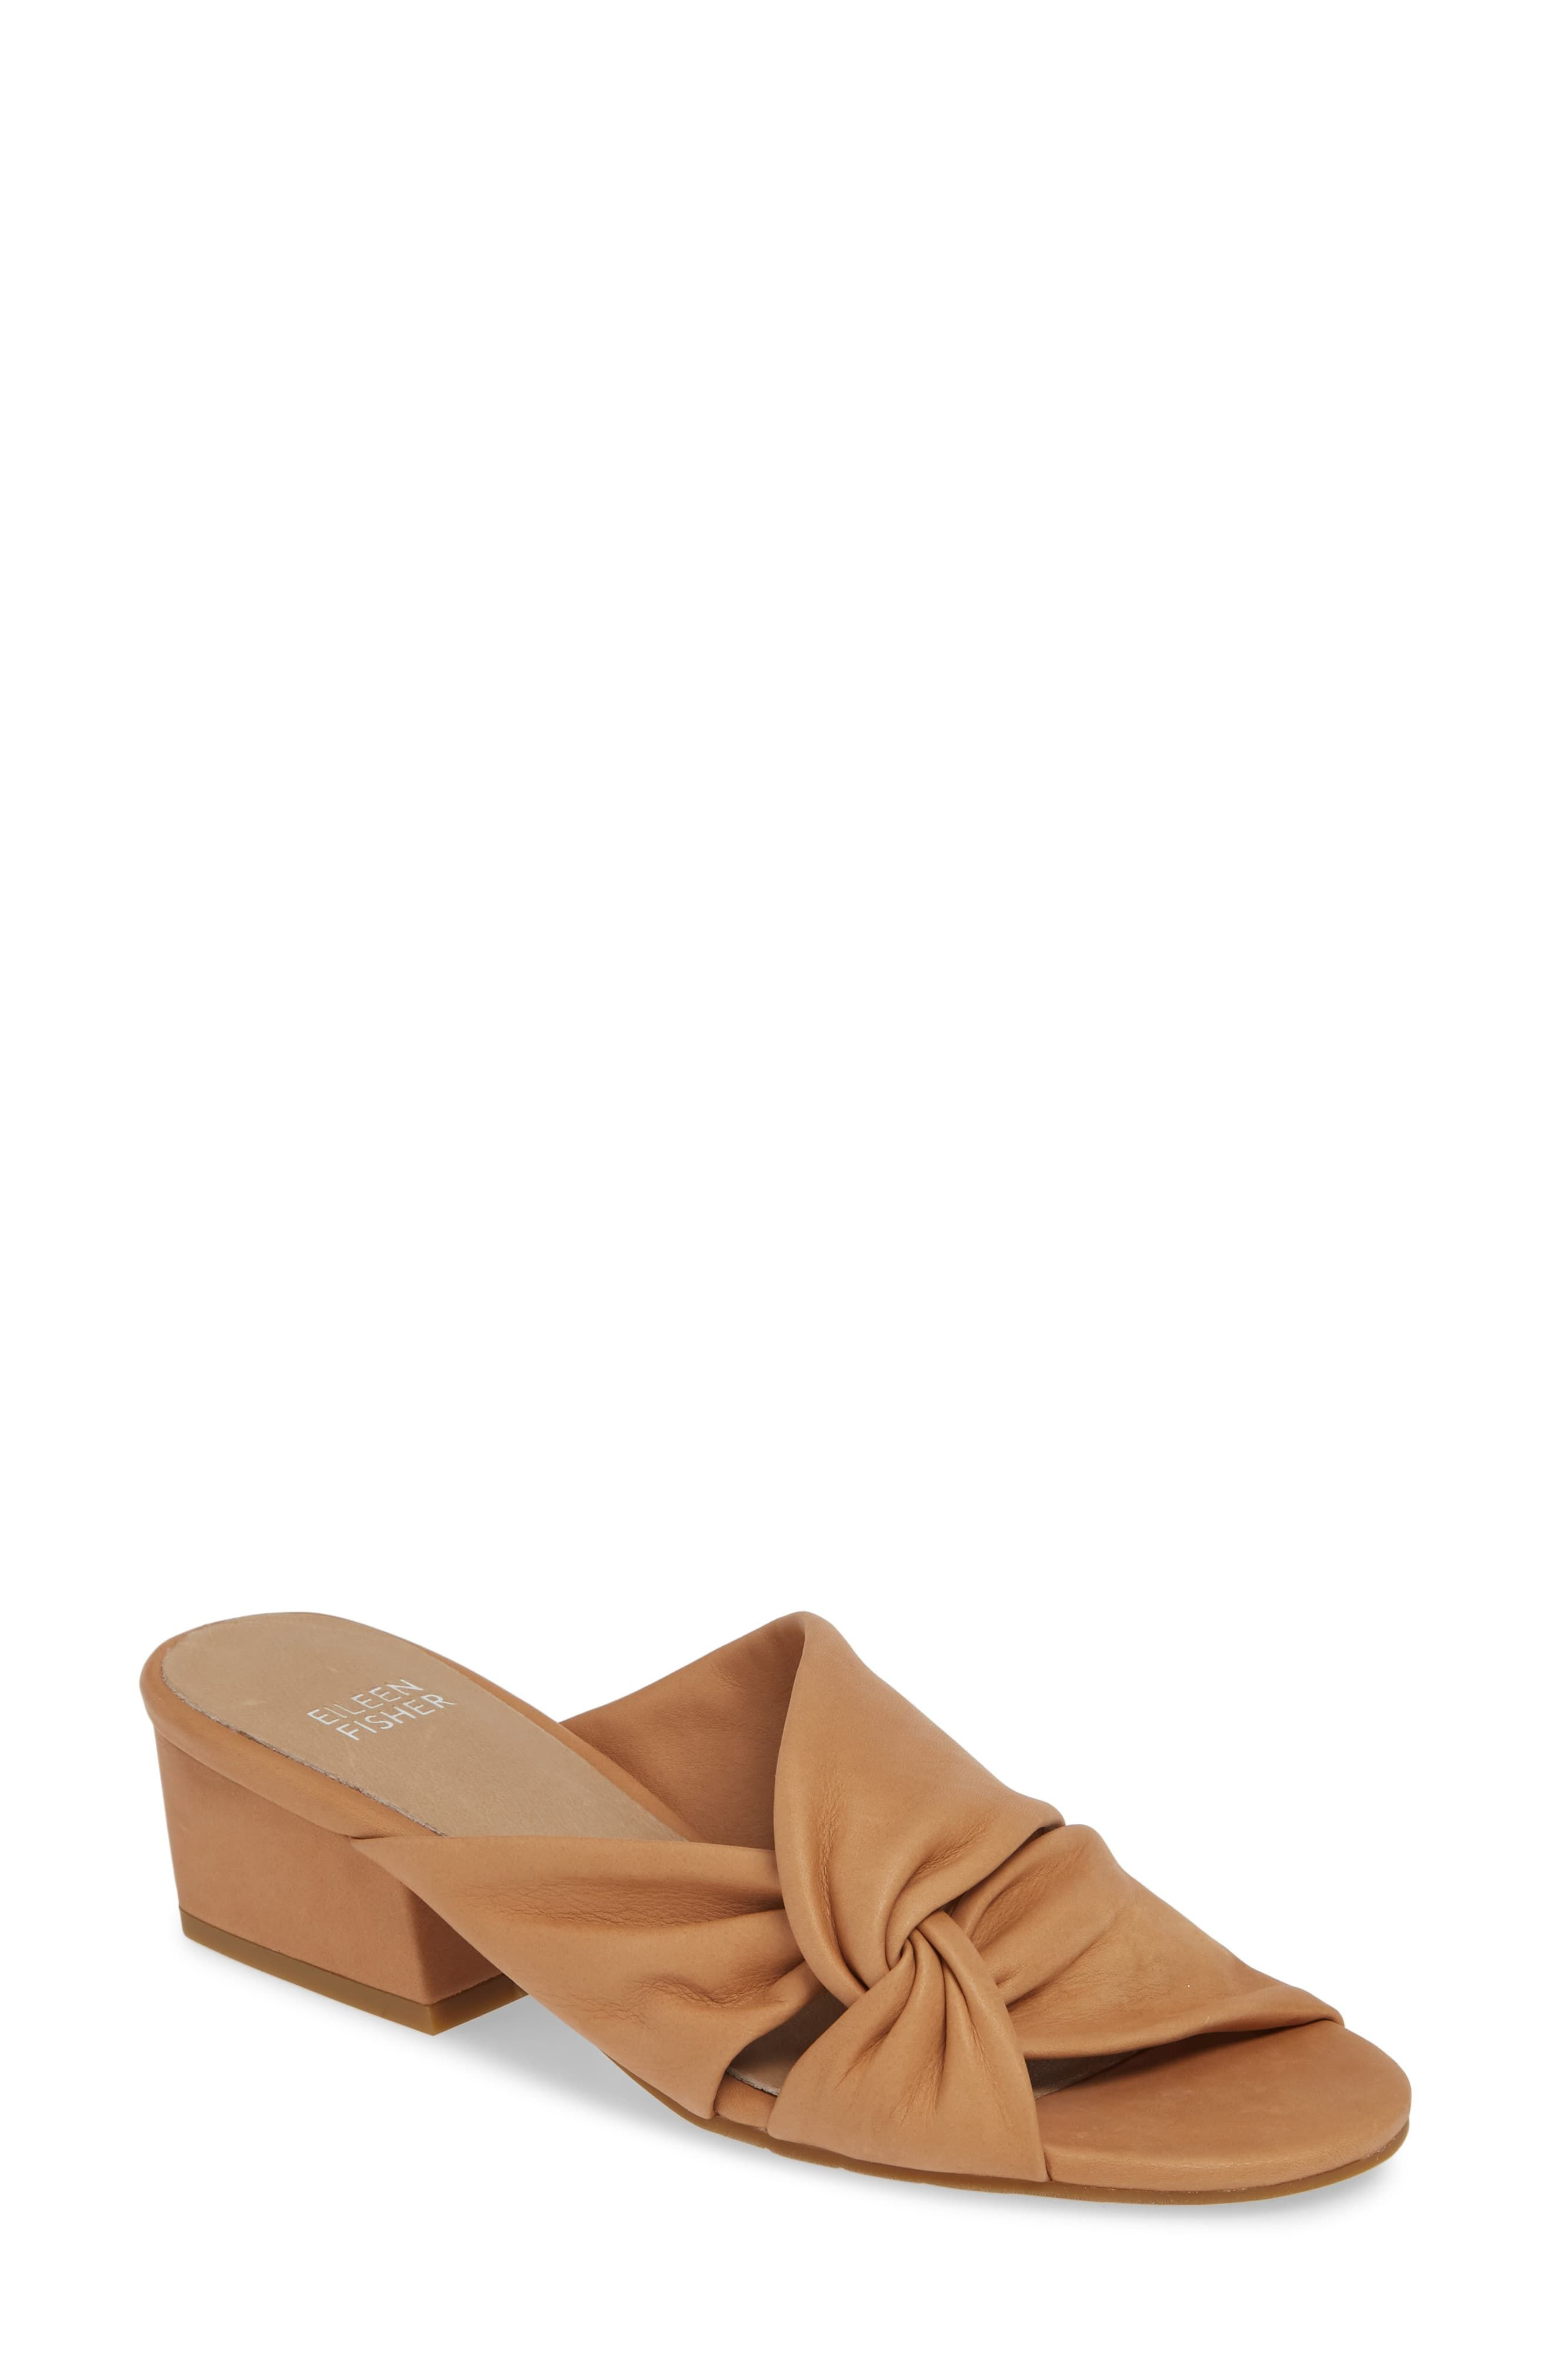 4e45e141223 Women's Stacia Knotted Satin Slide Sandals - A New Day™   Fantasy ...